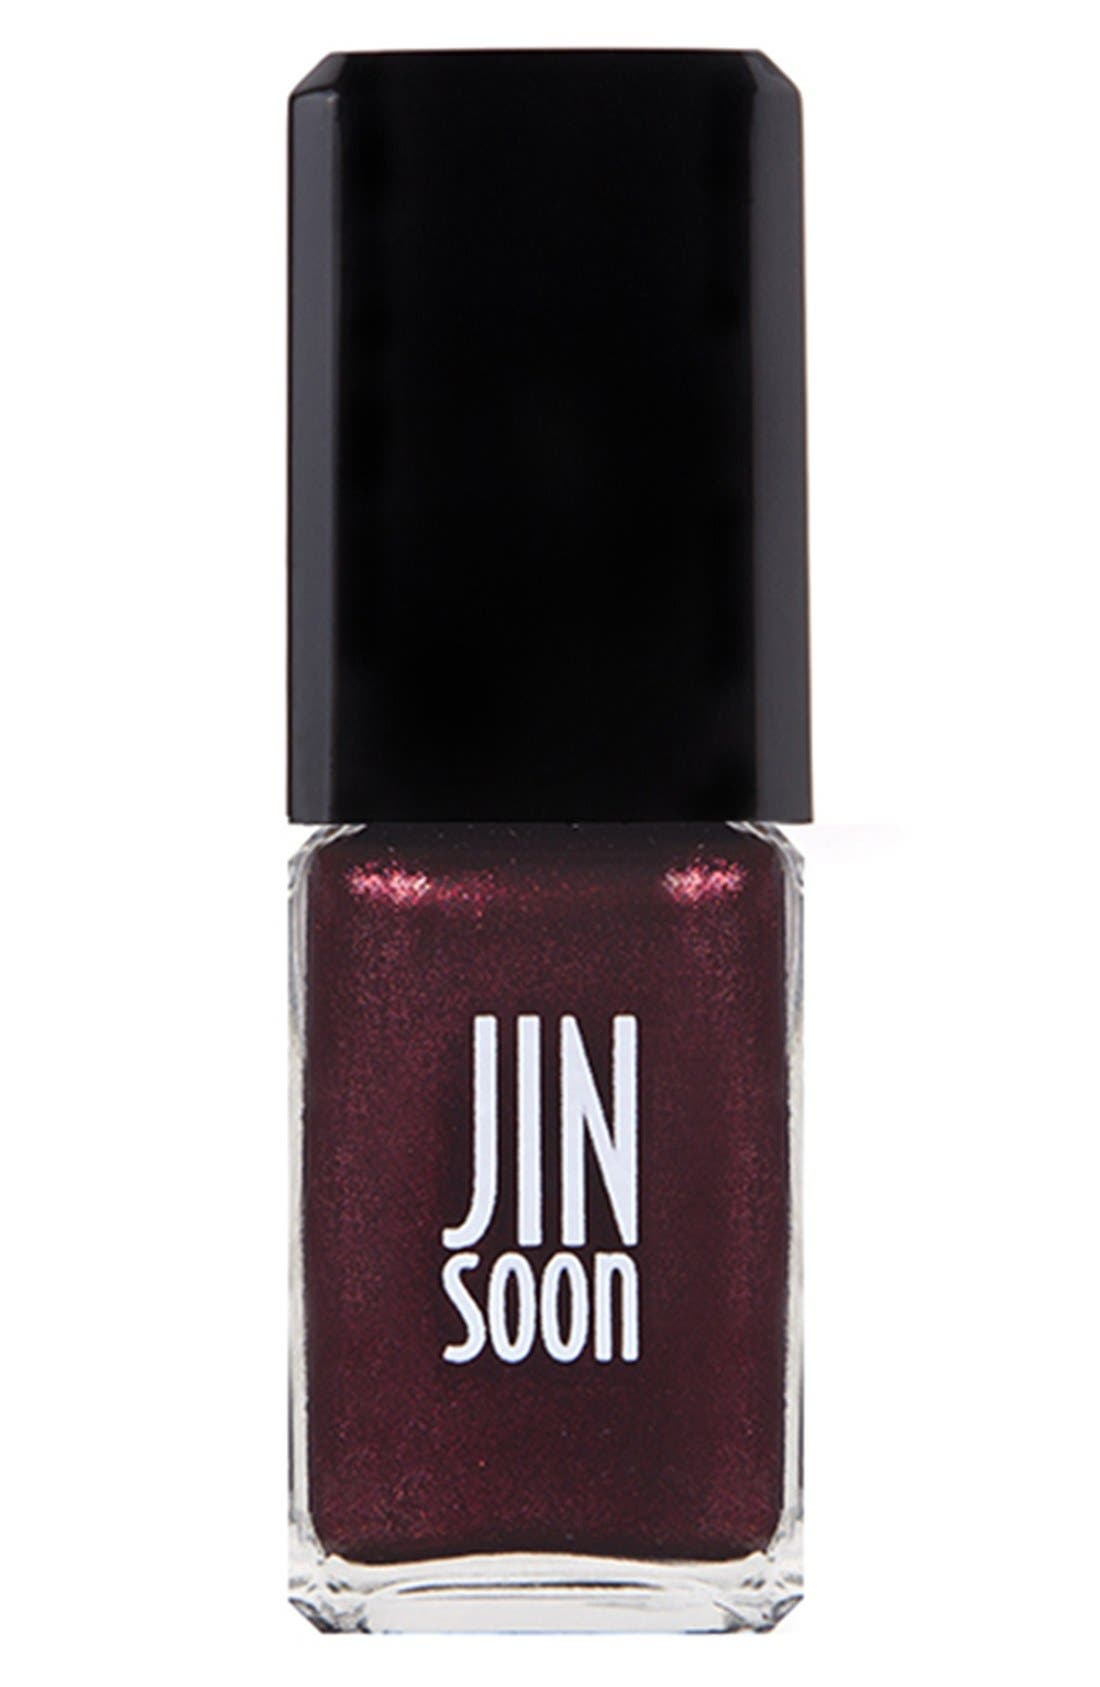 JINsoon 'Jasper' Nail Lacquer